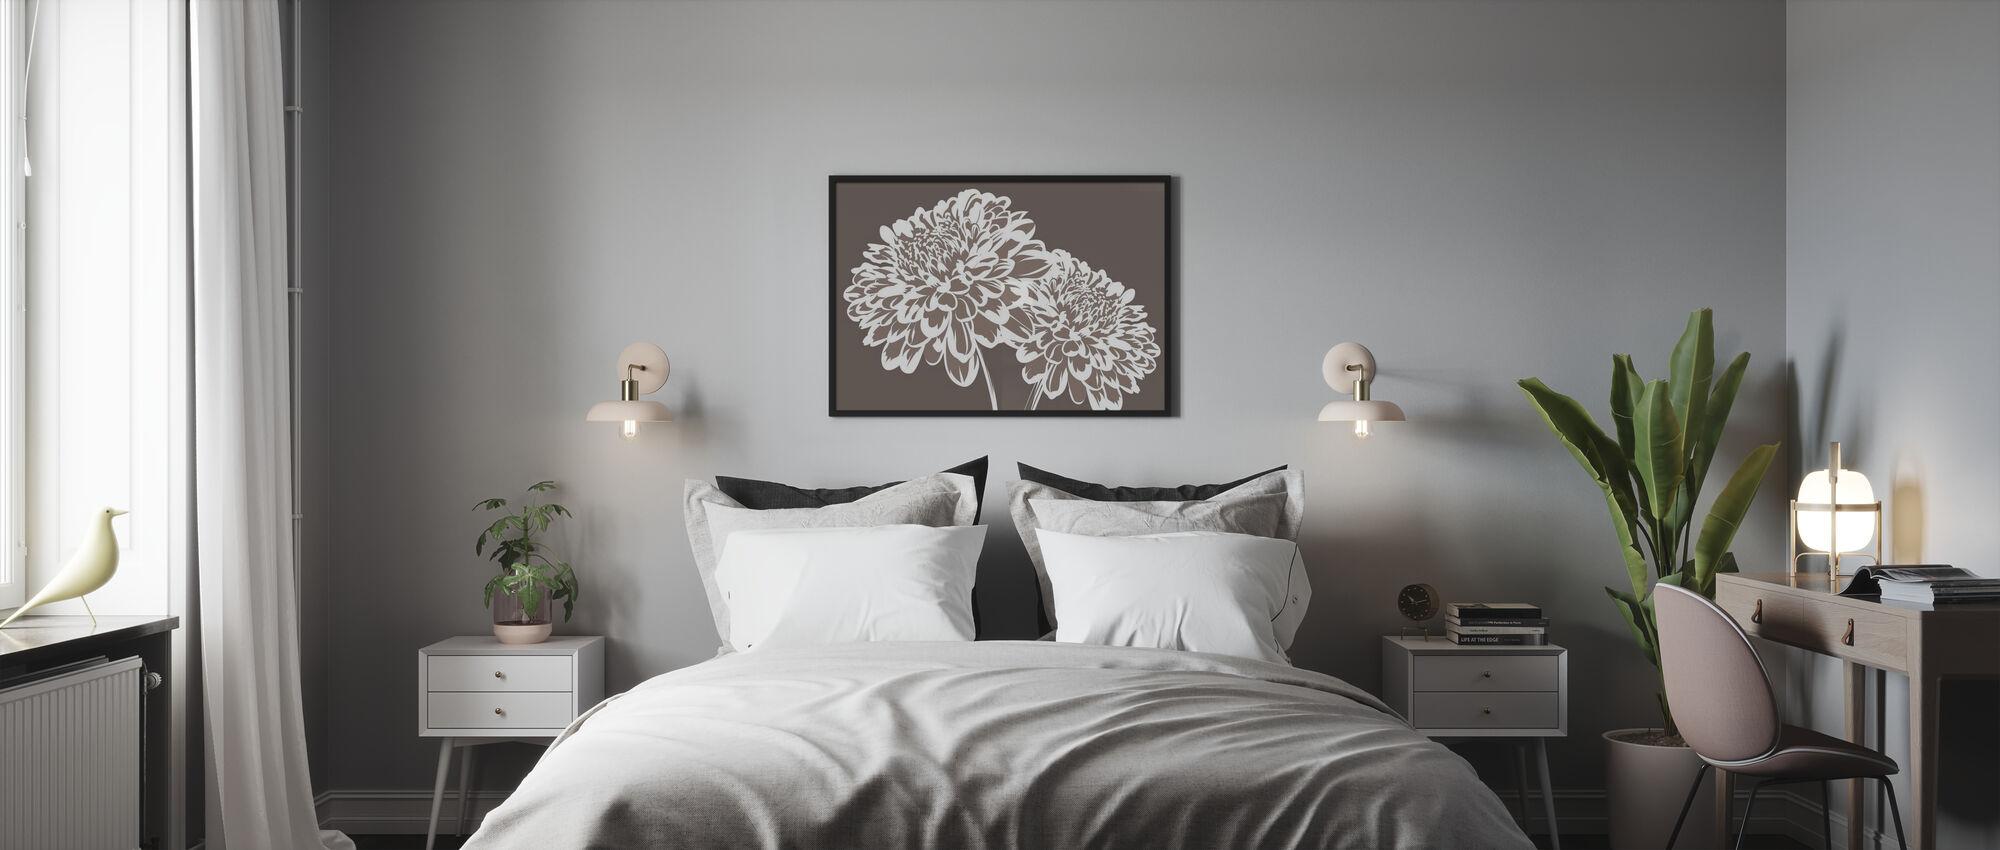 Blossom Sydämeni - Mullvad - Kehystetty kuva - Makuuhuone